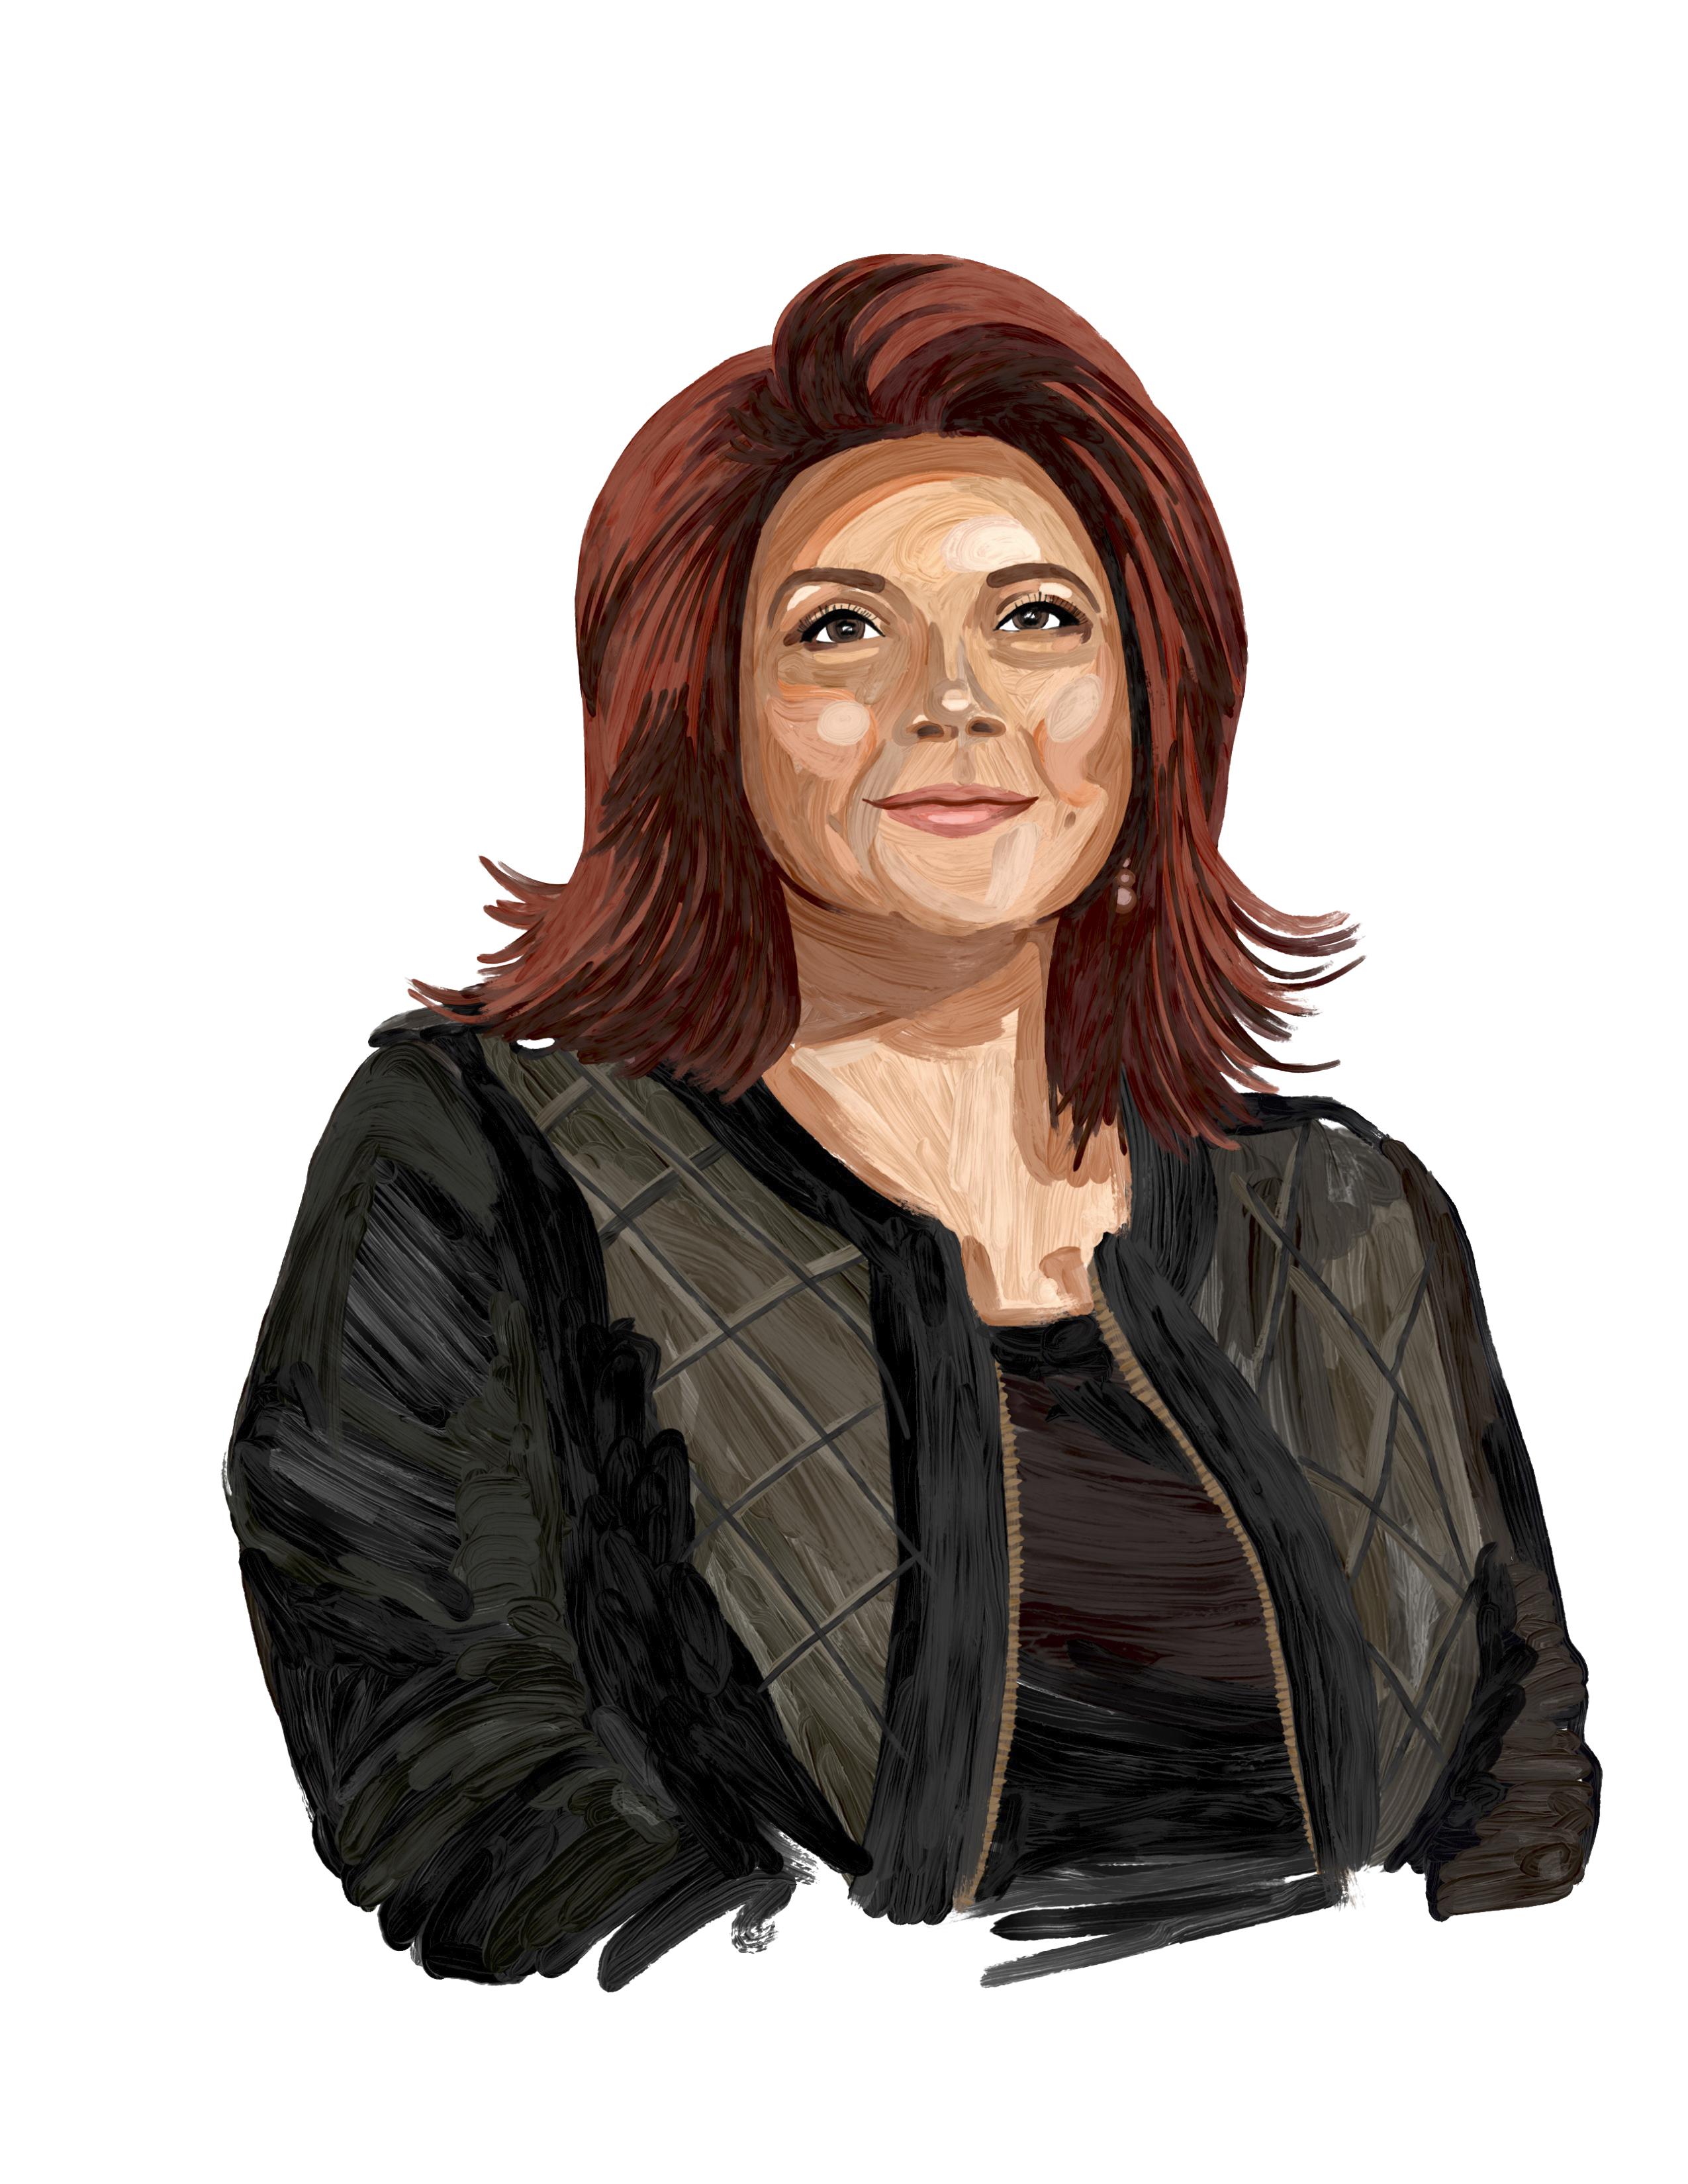 Ana Navarro - Poderosas - April 2019